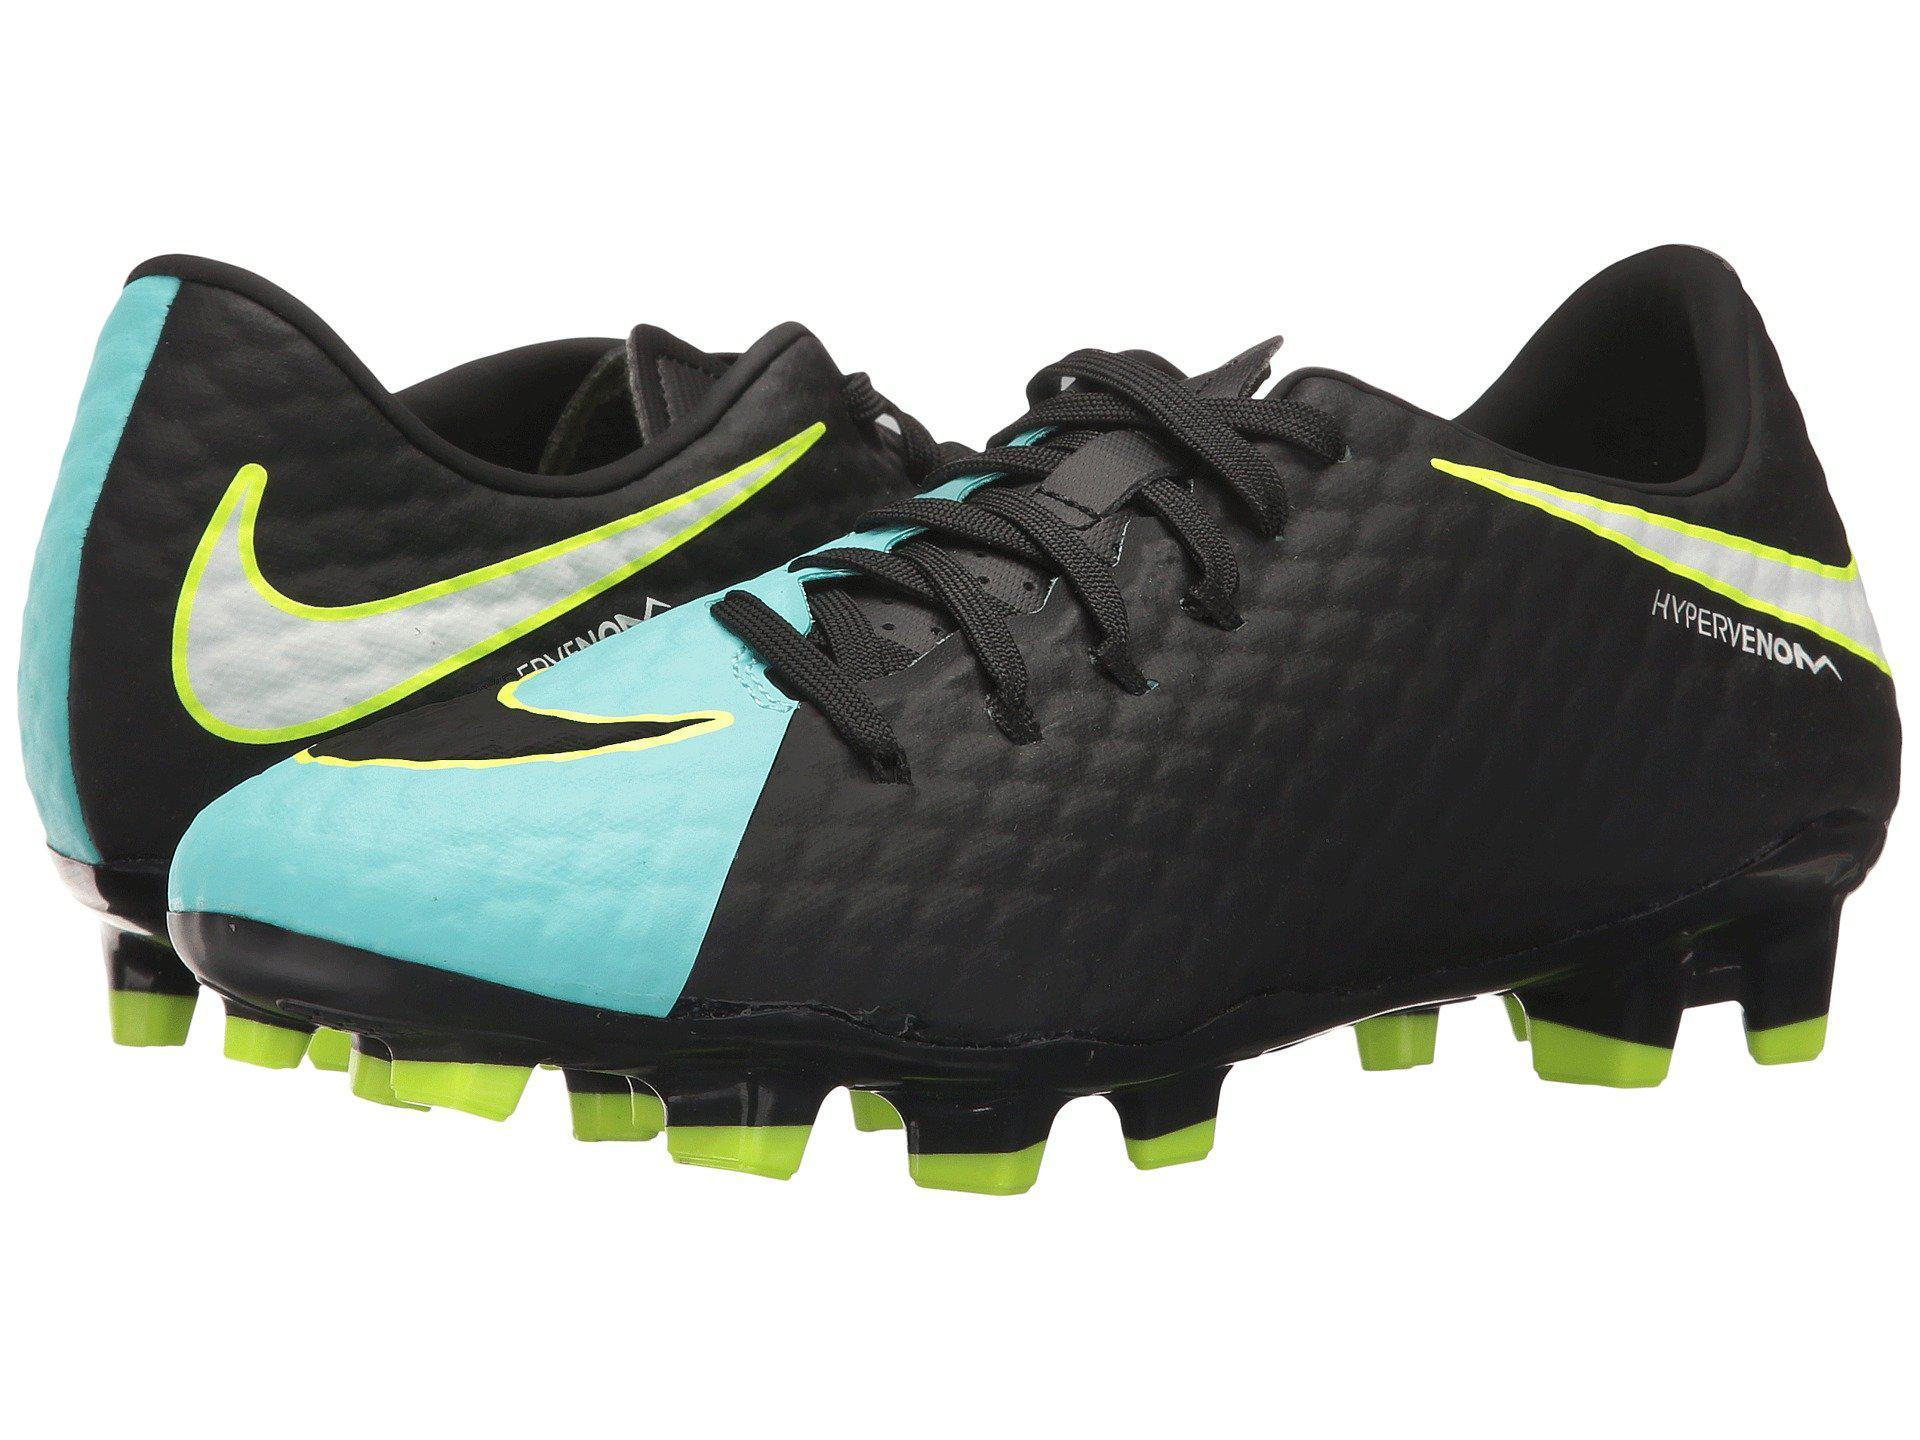 7b7c18dcf Lyst - Nike Hypervenom Phelon Iii Fg in Black